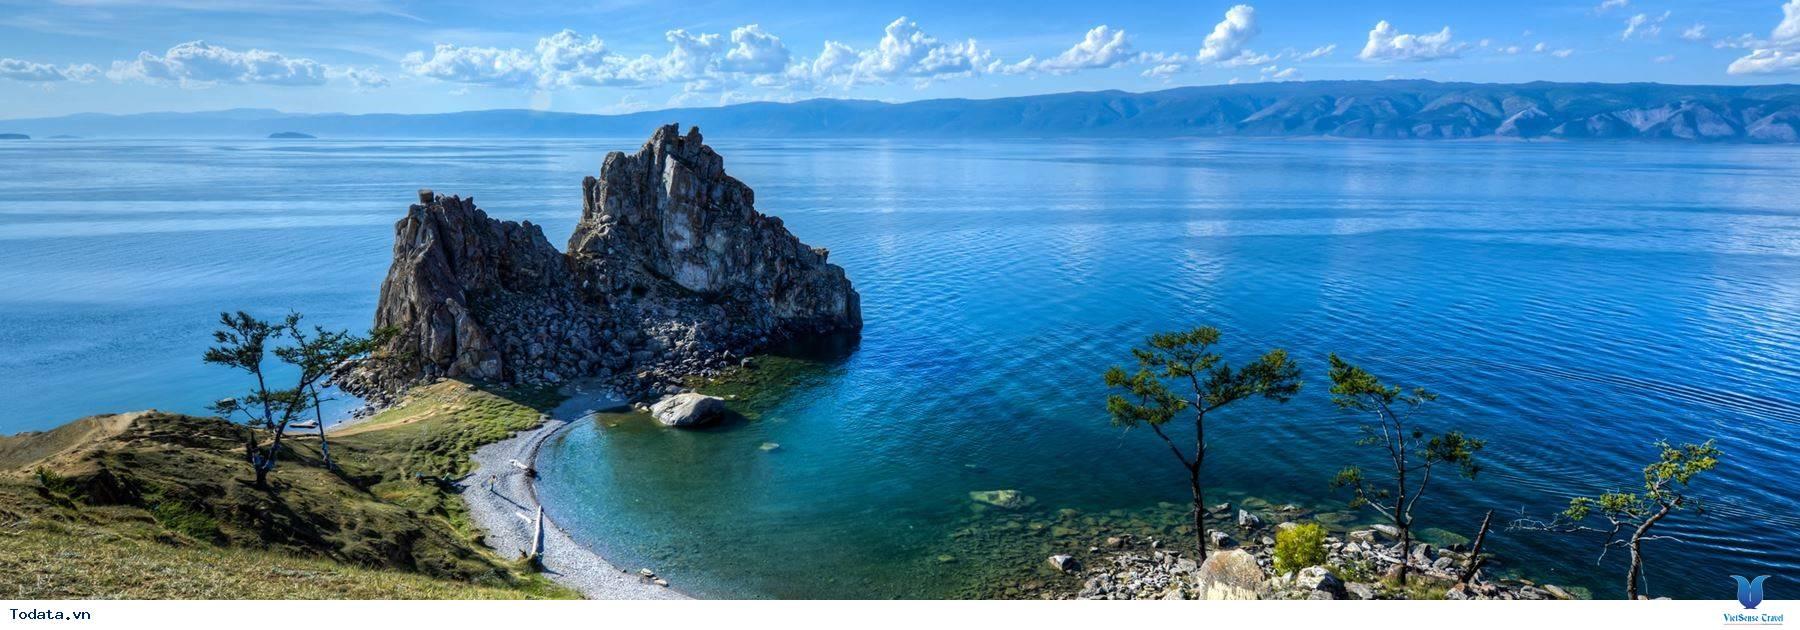 Khám phá hồ Baikal - Siberia 7 ngày - Ảnh 1